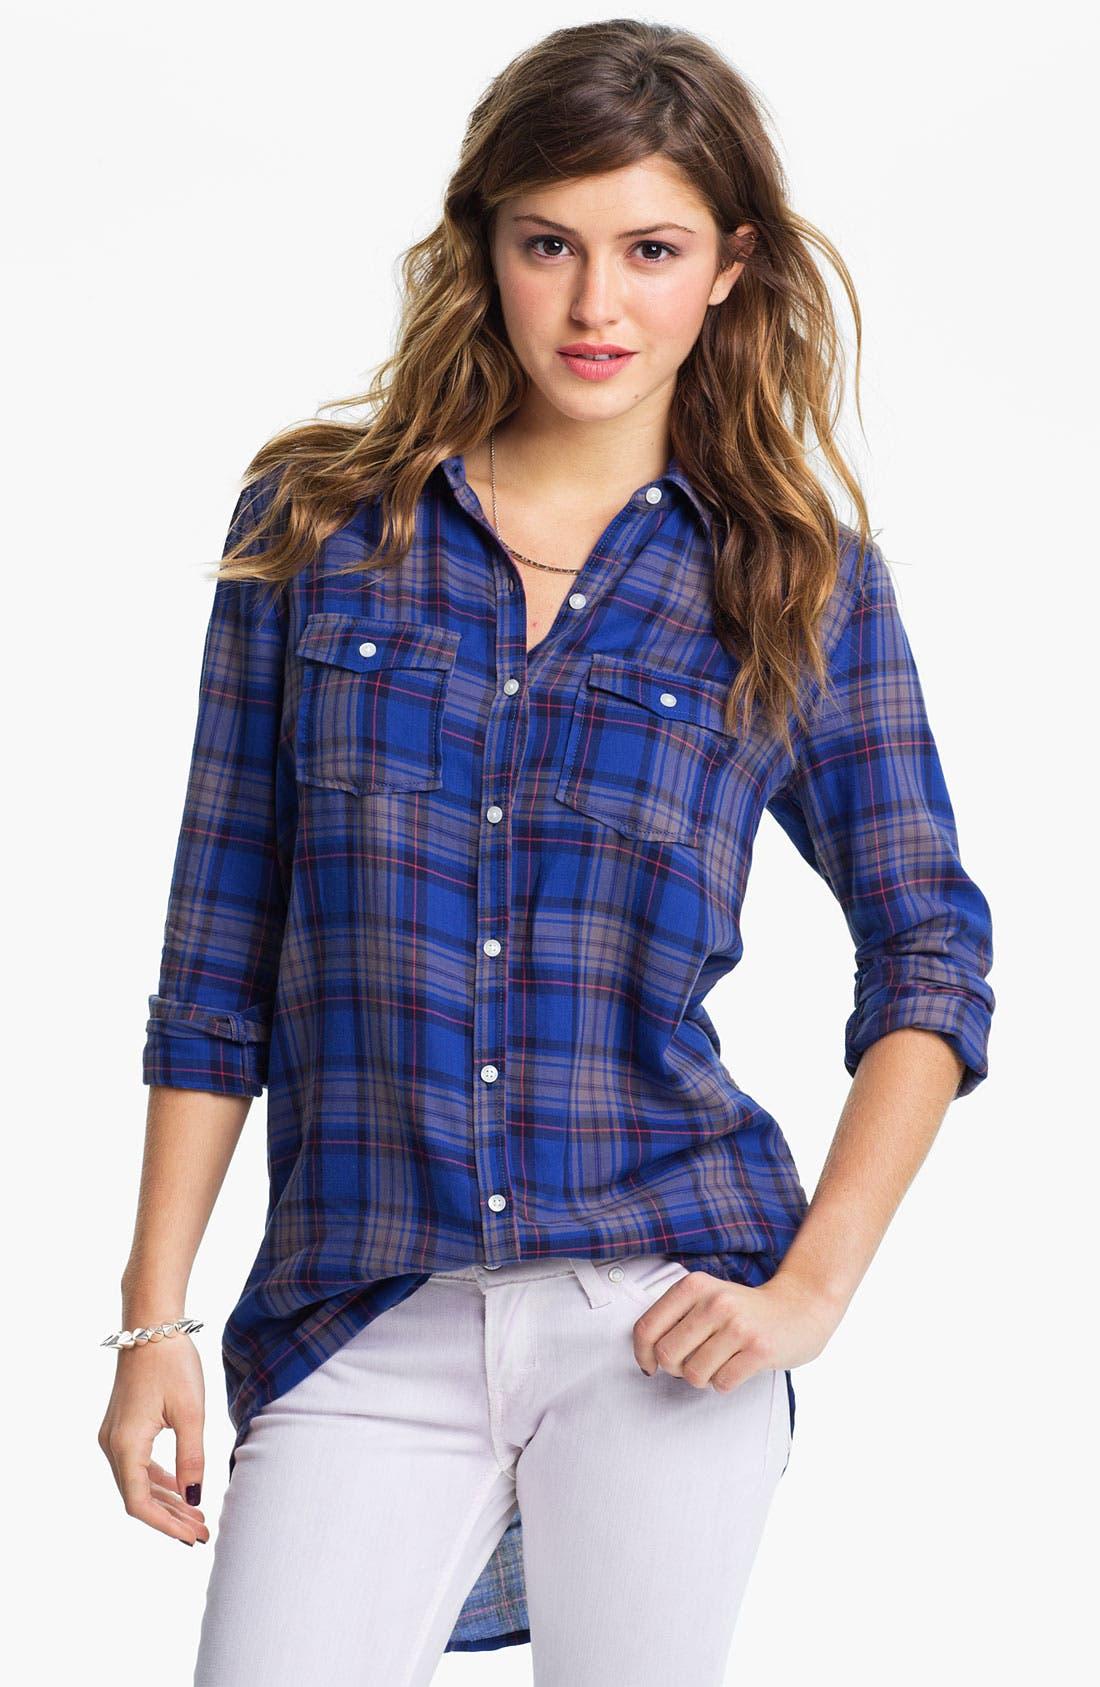 Alternate Image 1 Selected - Rubbish® Plaid Shirt Tunic (Juniors)